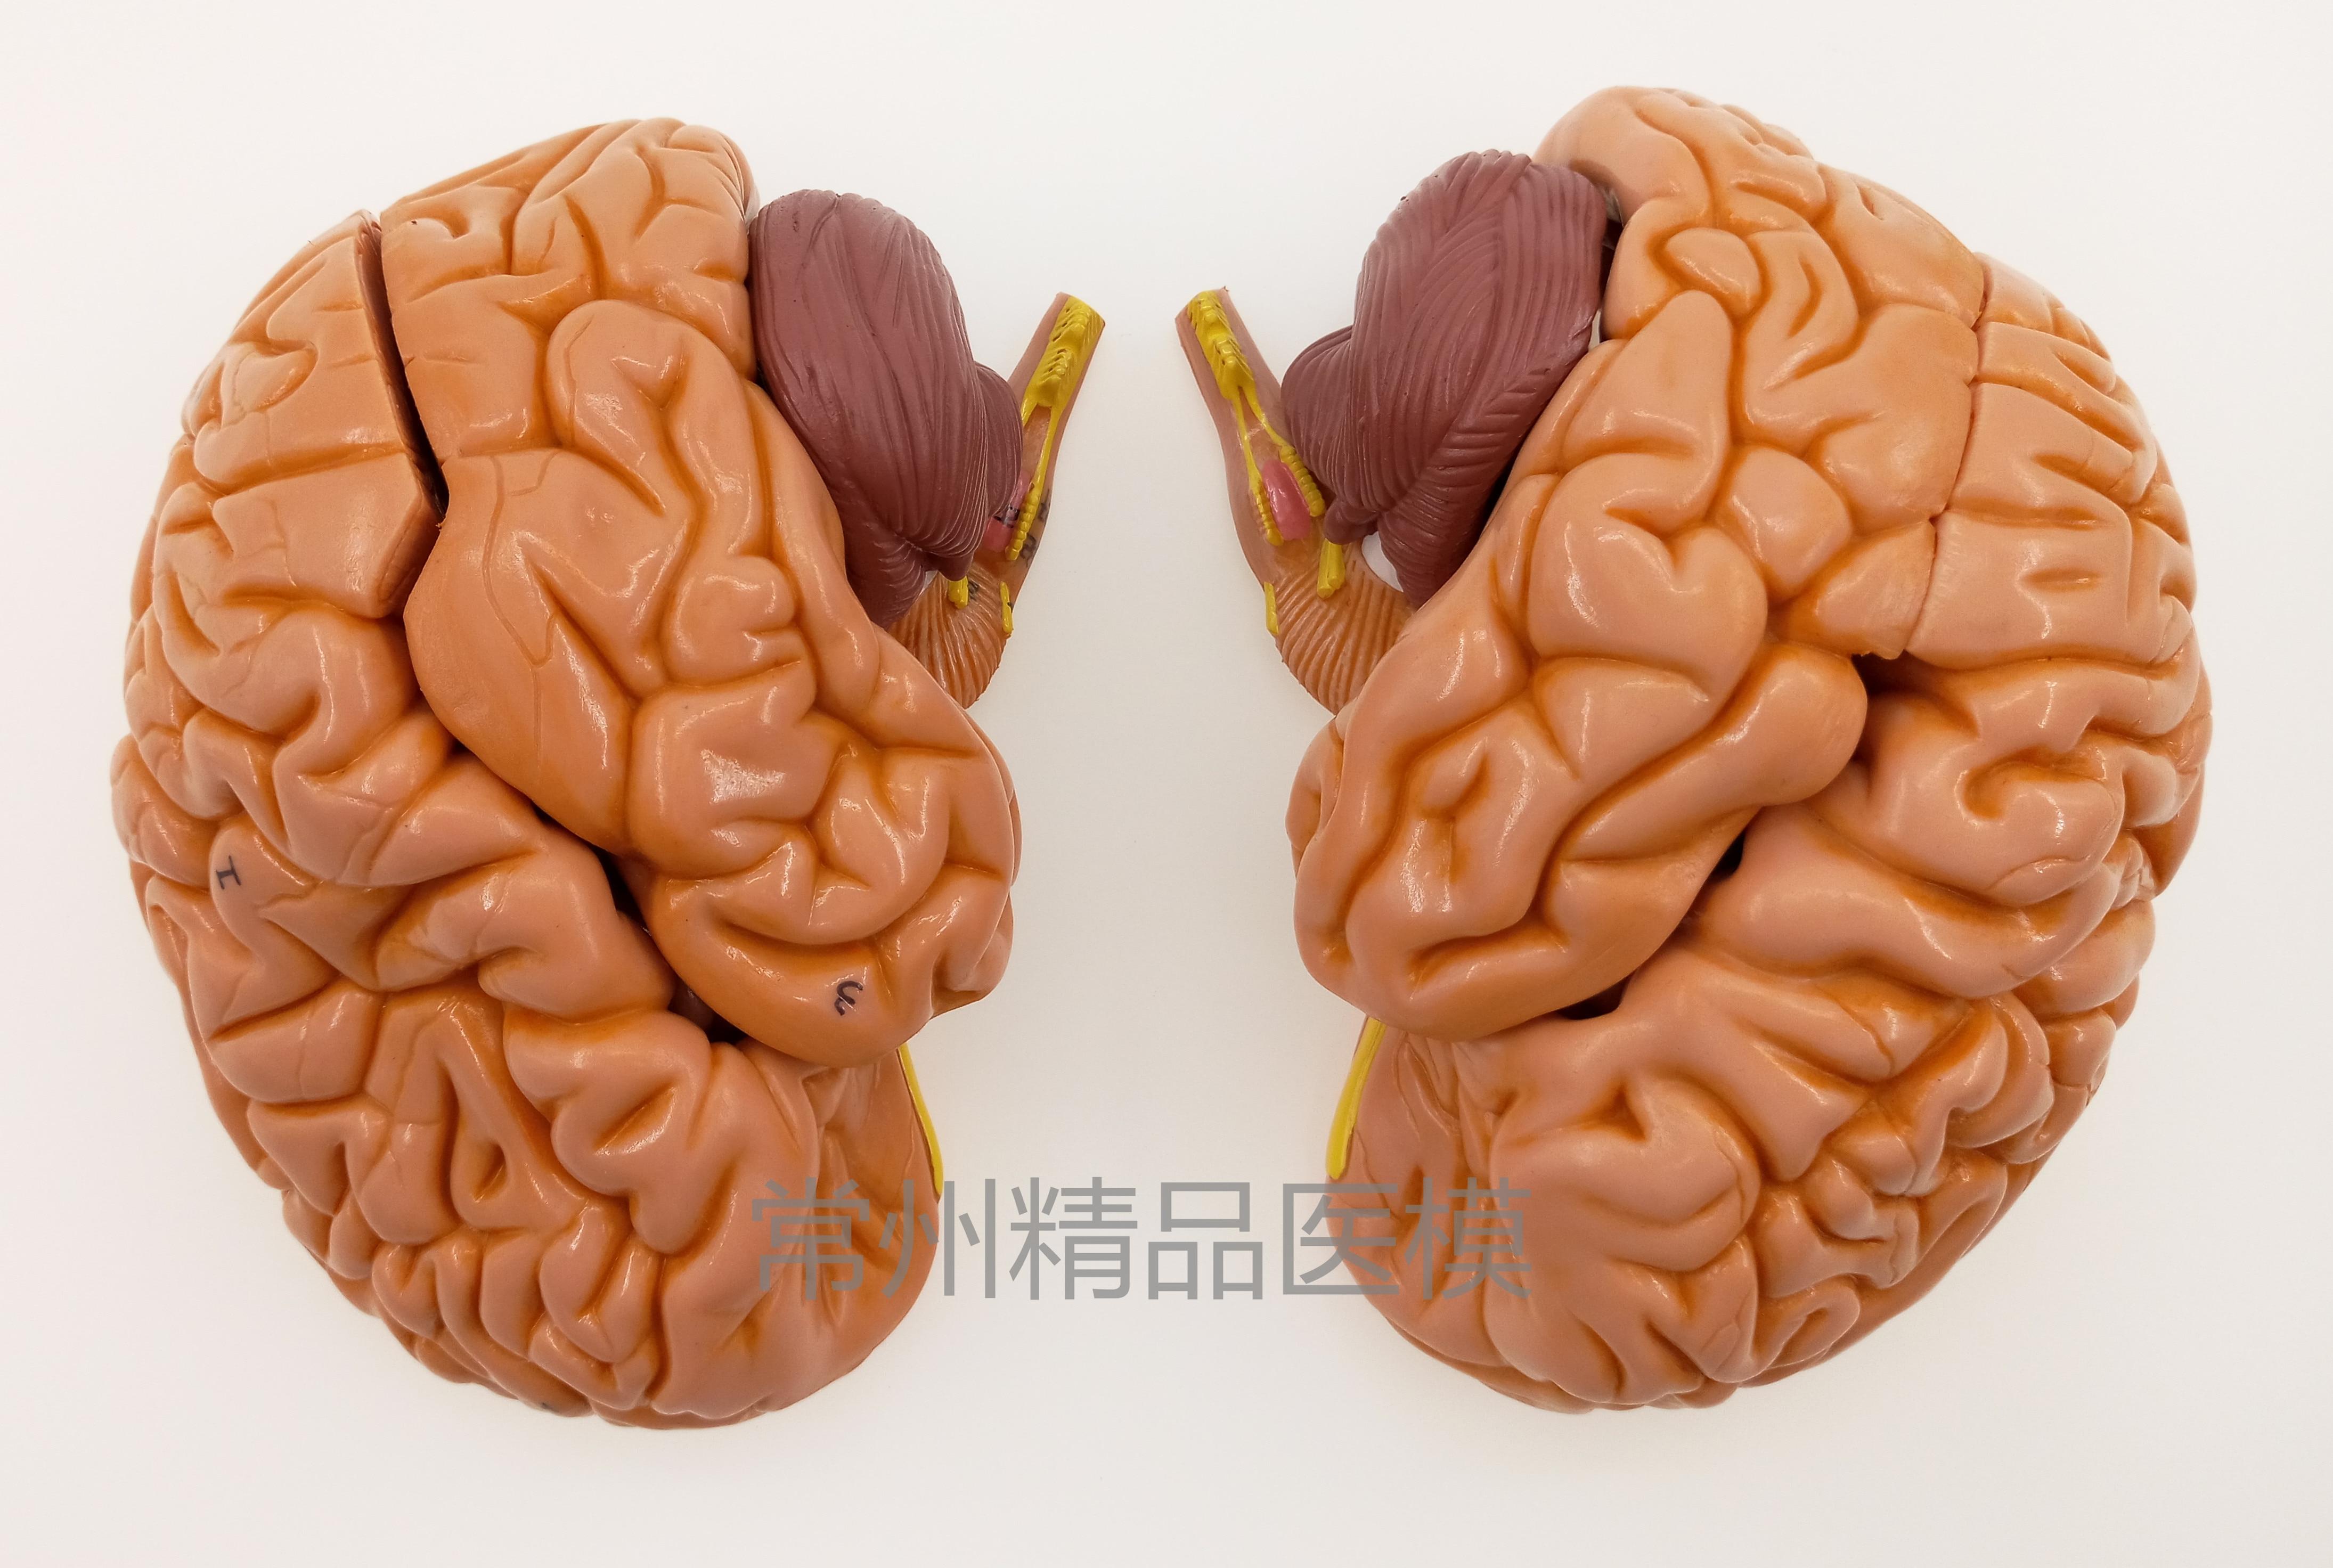 1:1 Life Size Brain Anatomical Model,Human Cerebral Artery Model ...